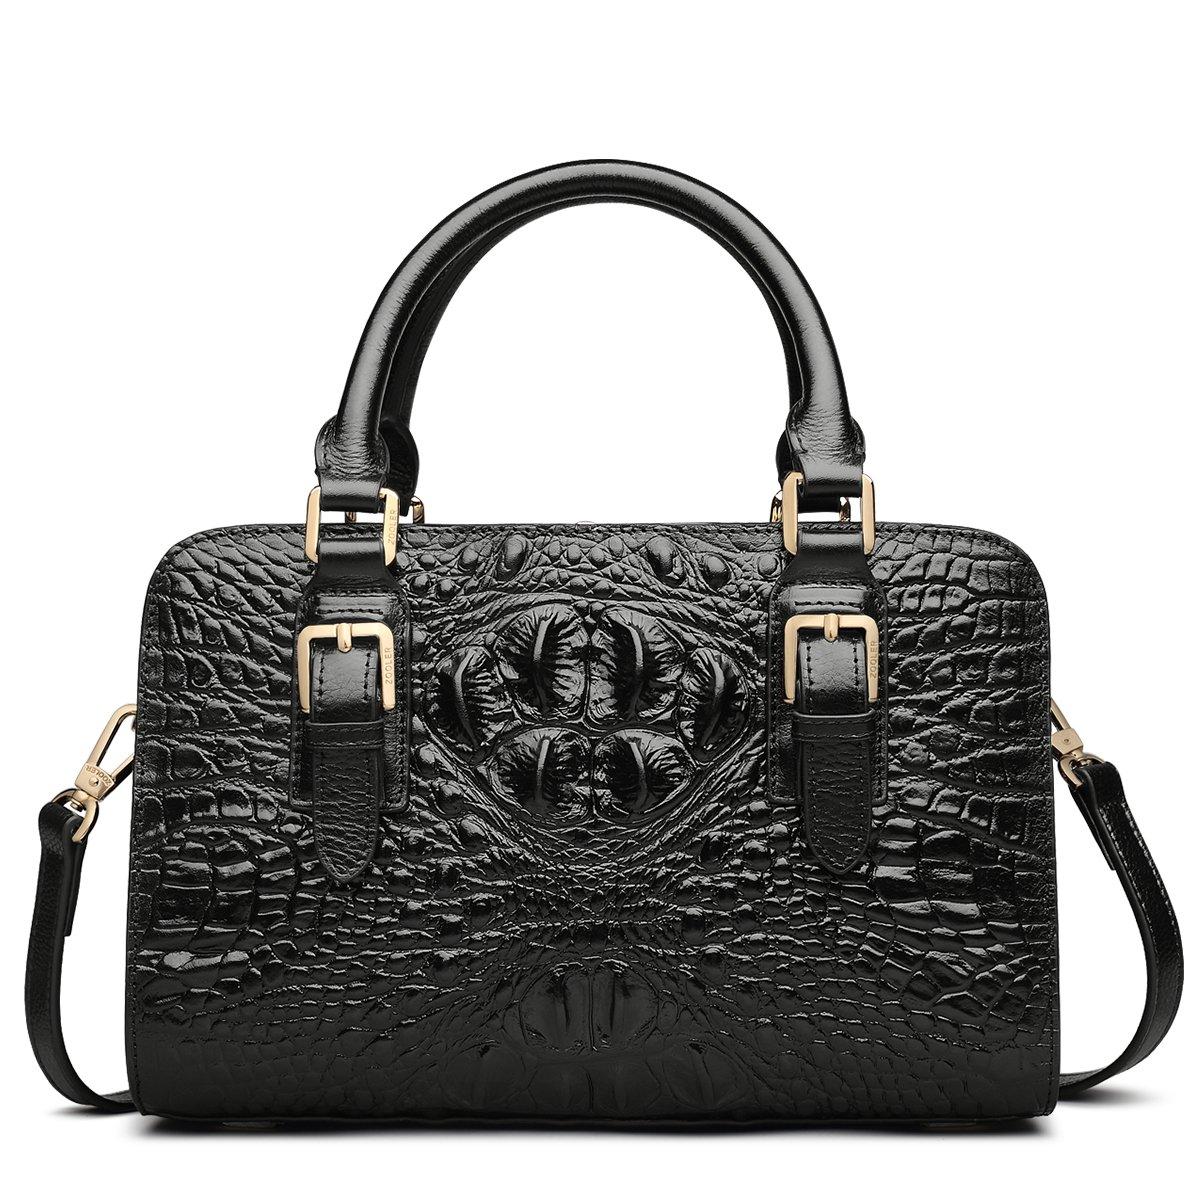 ZOOLER GLOBAL Genuine Leather Handbag Crocodile Embrossed Luxury Top Designer Purse Black